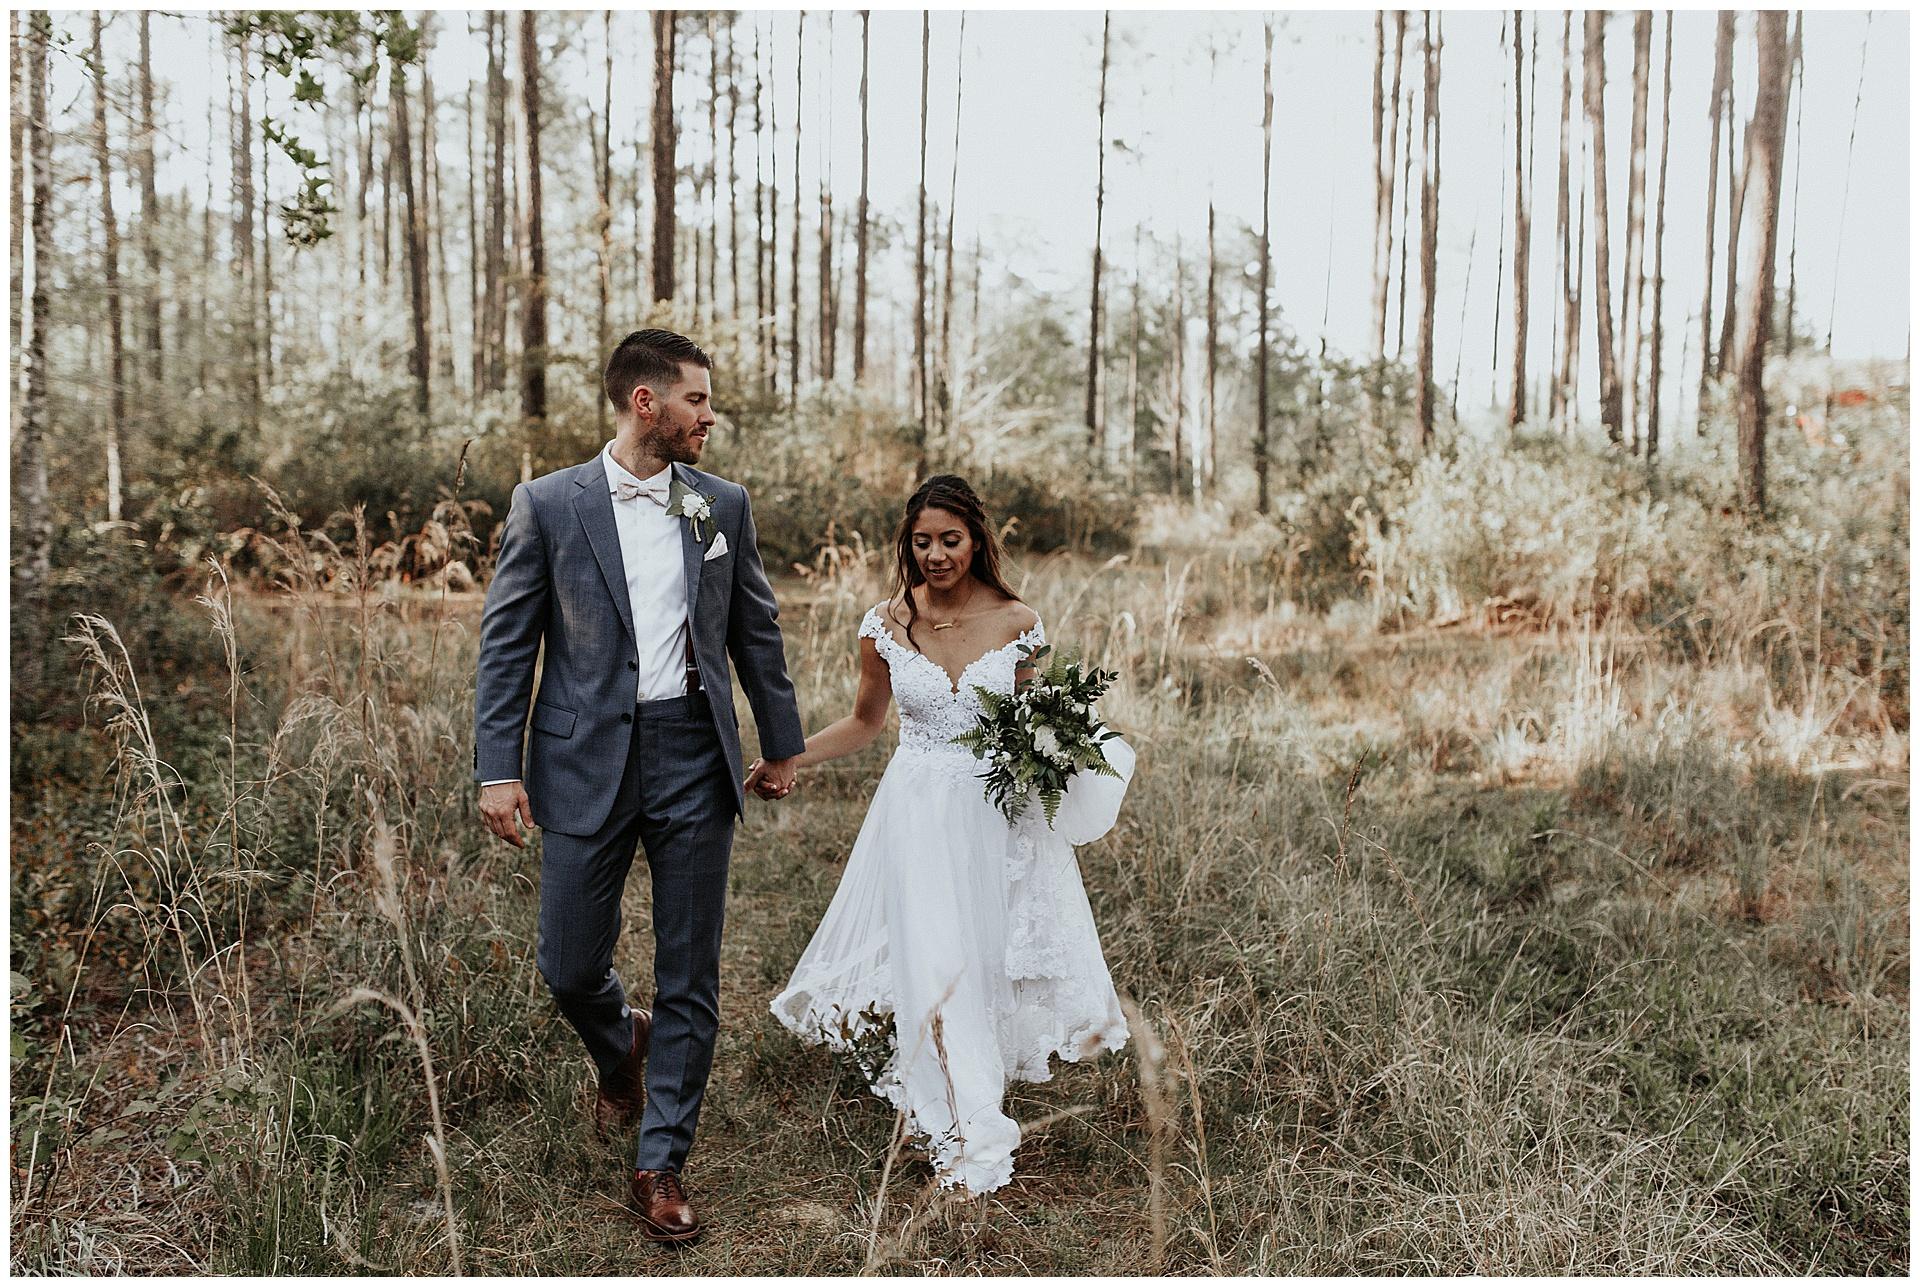 st augustine wedding photographer_mia dimare photography34.jpg